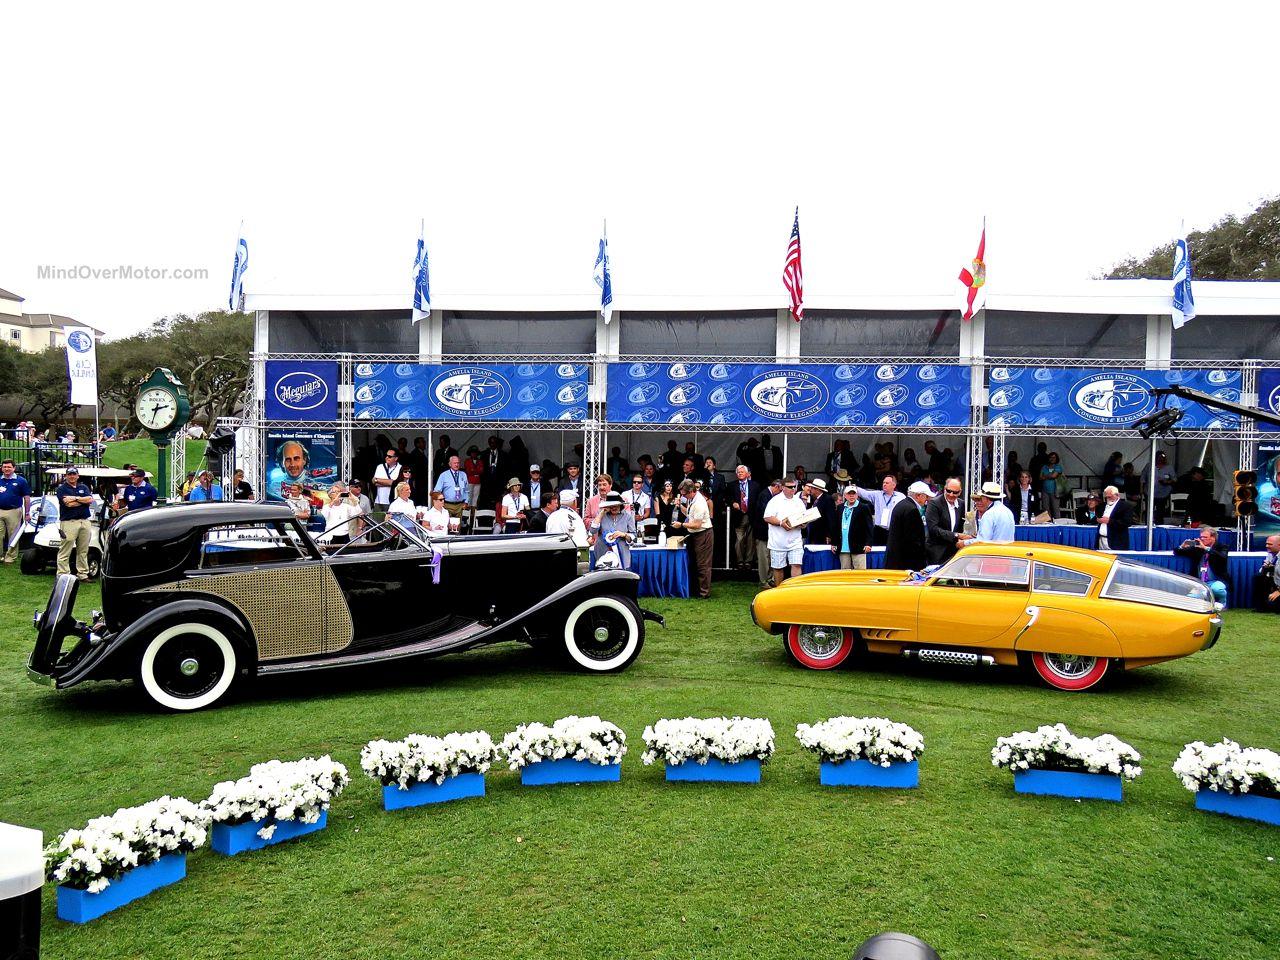 Amelia Island Concours Pegaso and Rolls Royce Winners